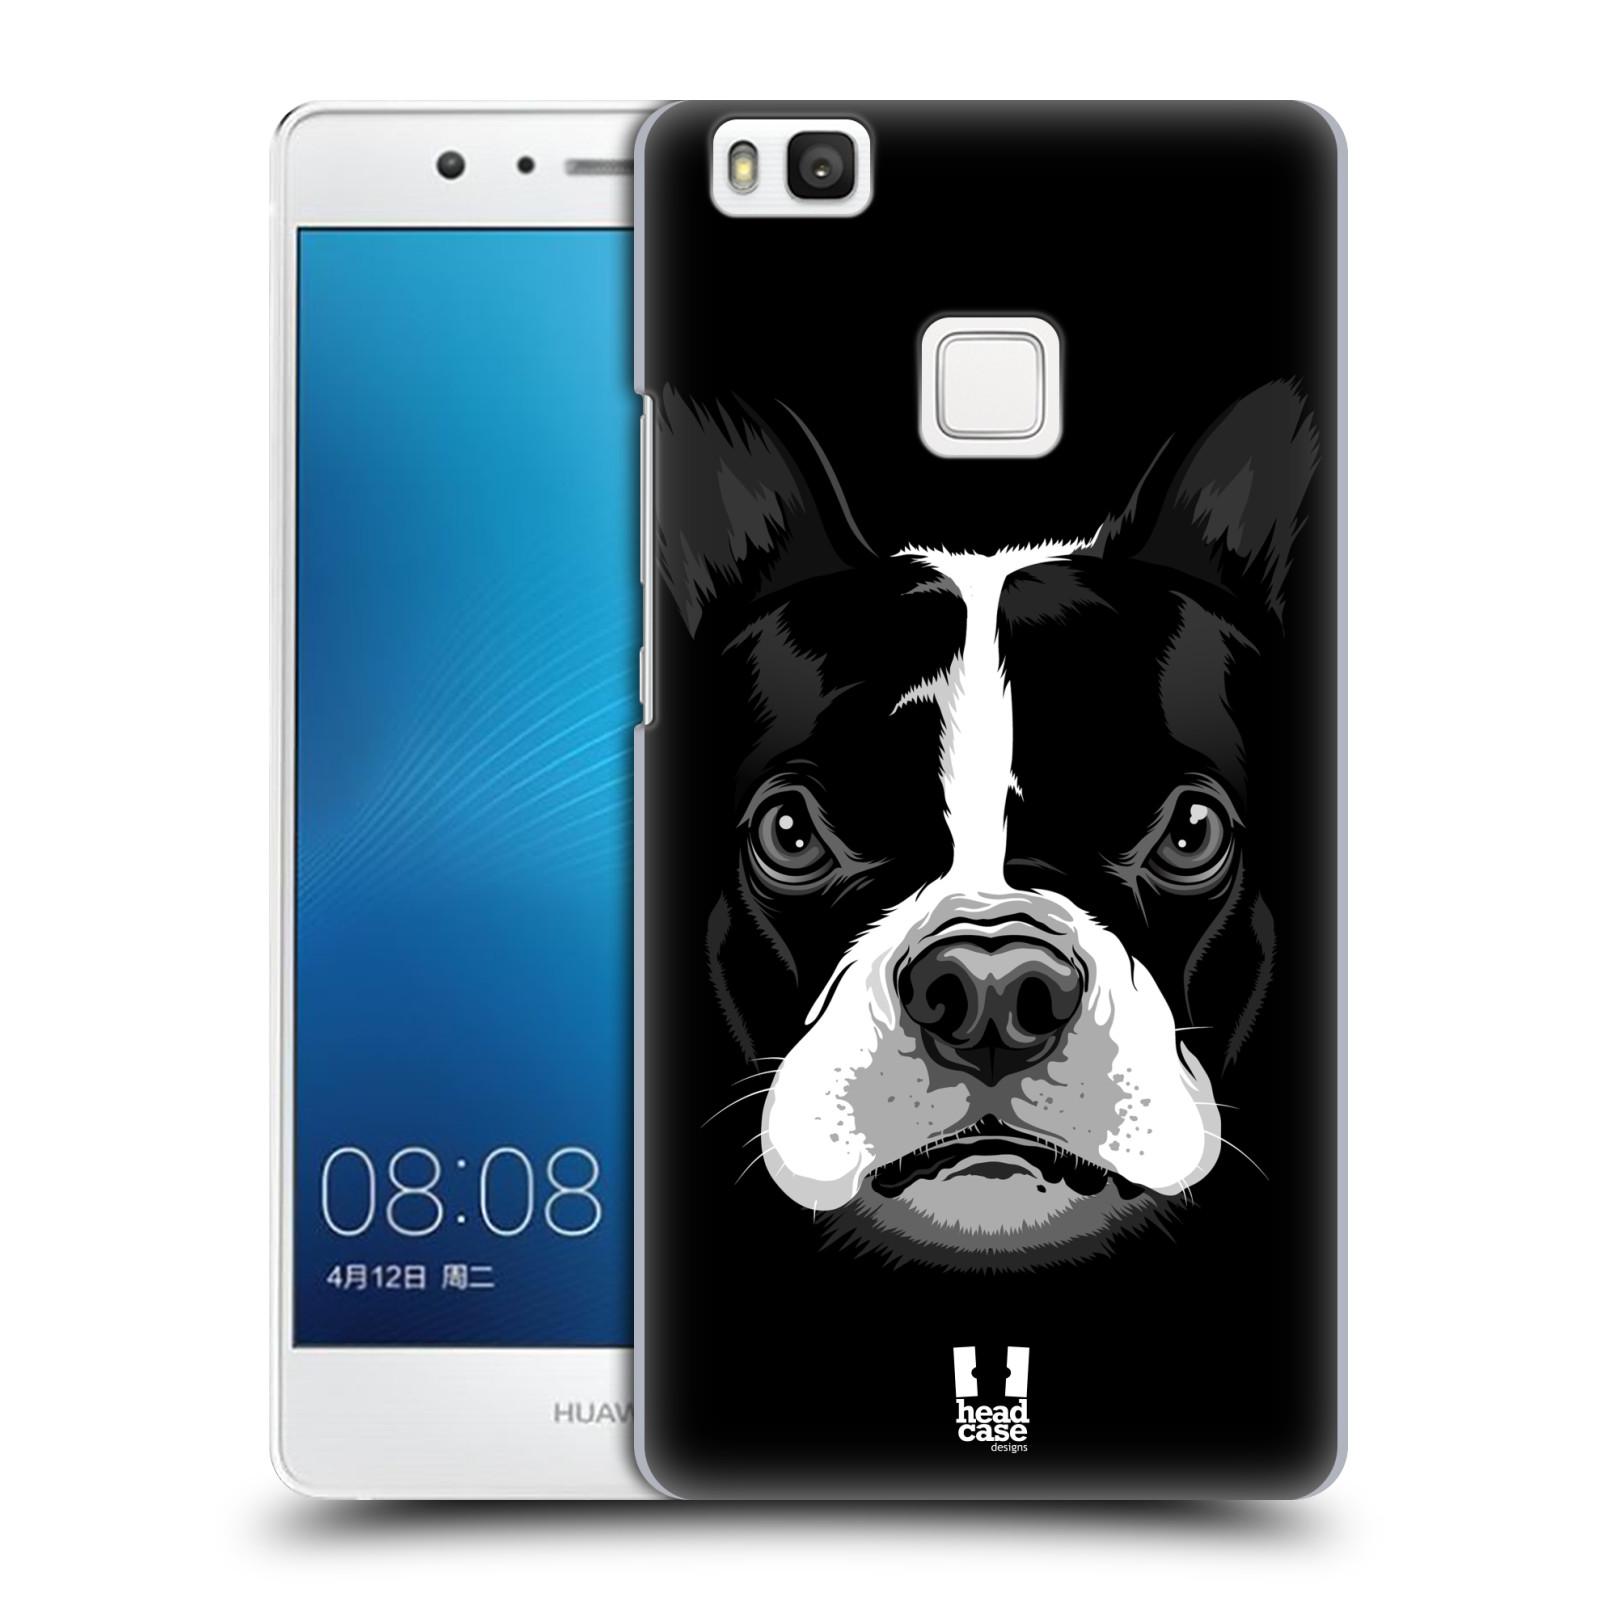 Plastové pouzdro na mobil Huawei P9 Lite HEAD CASE ILUSTROVANÝ BULDOČEK